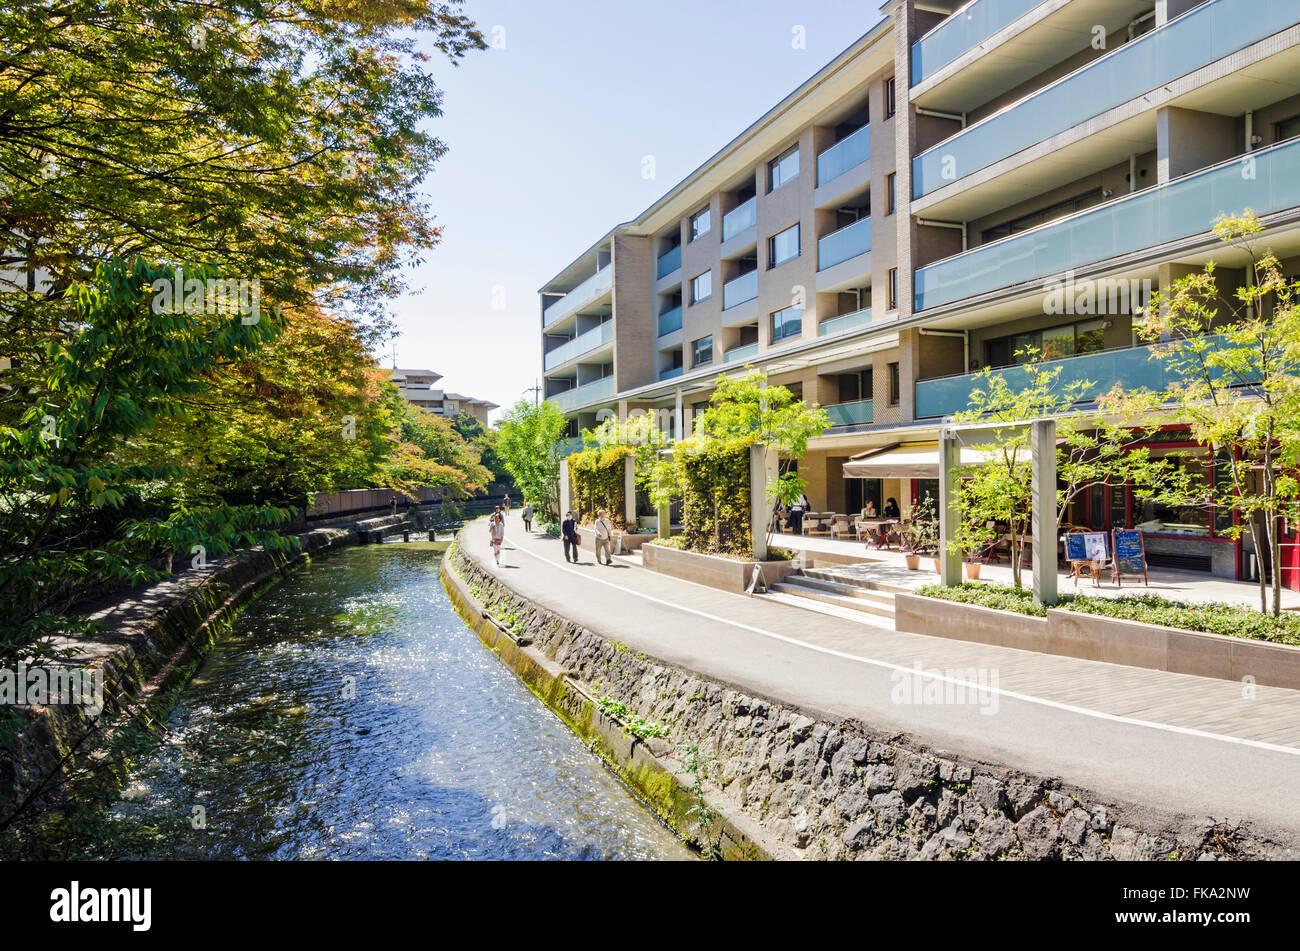 Modern building along the inner city bank of the Shirakawa River near Niomon Dori road, Kyoto, Japan - Stock Image